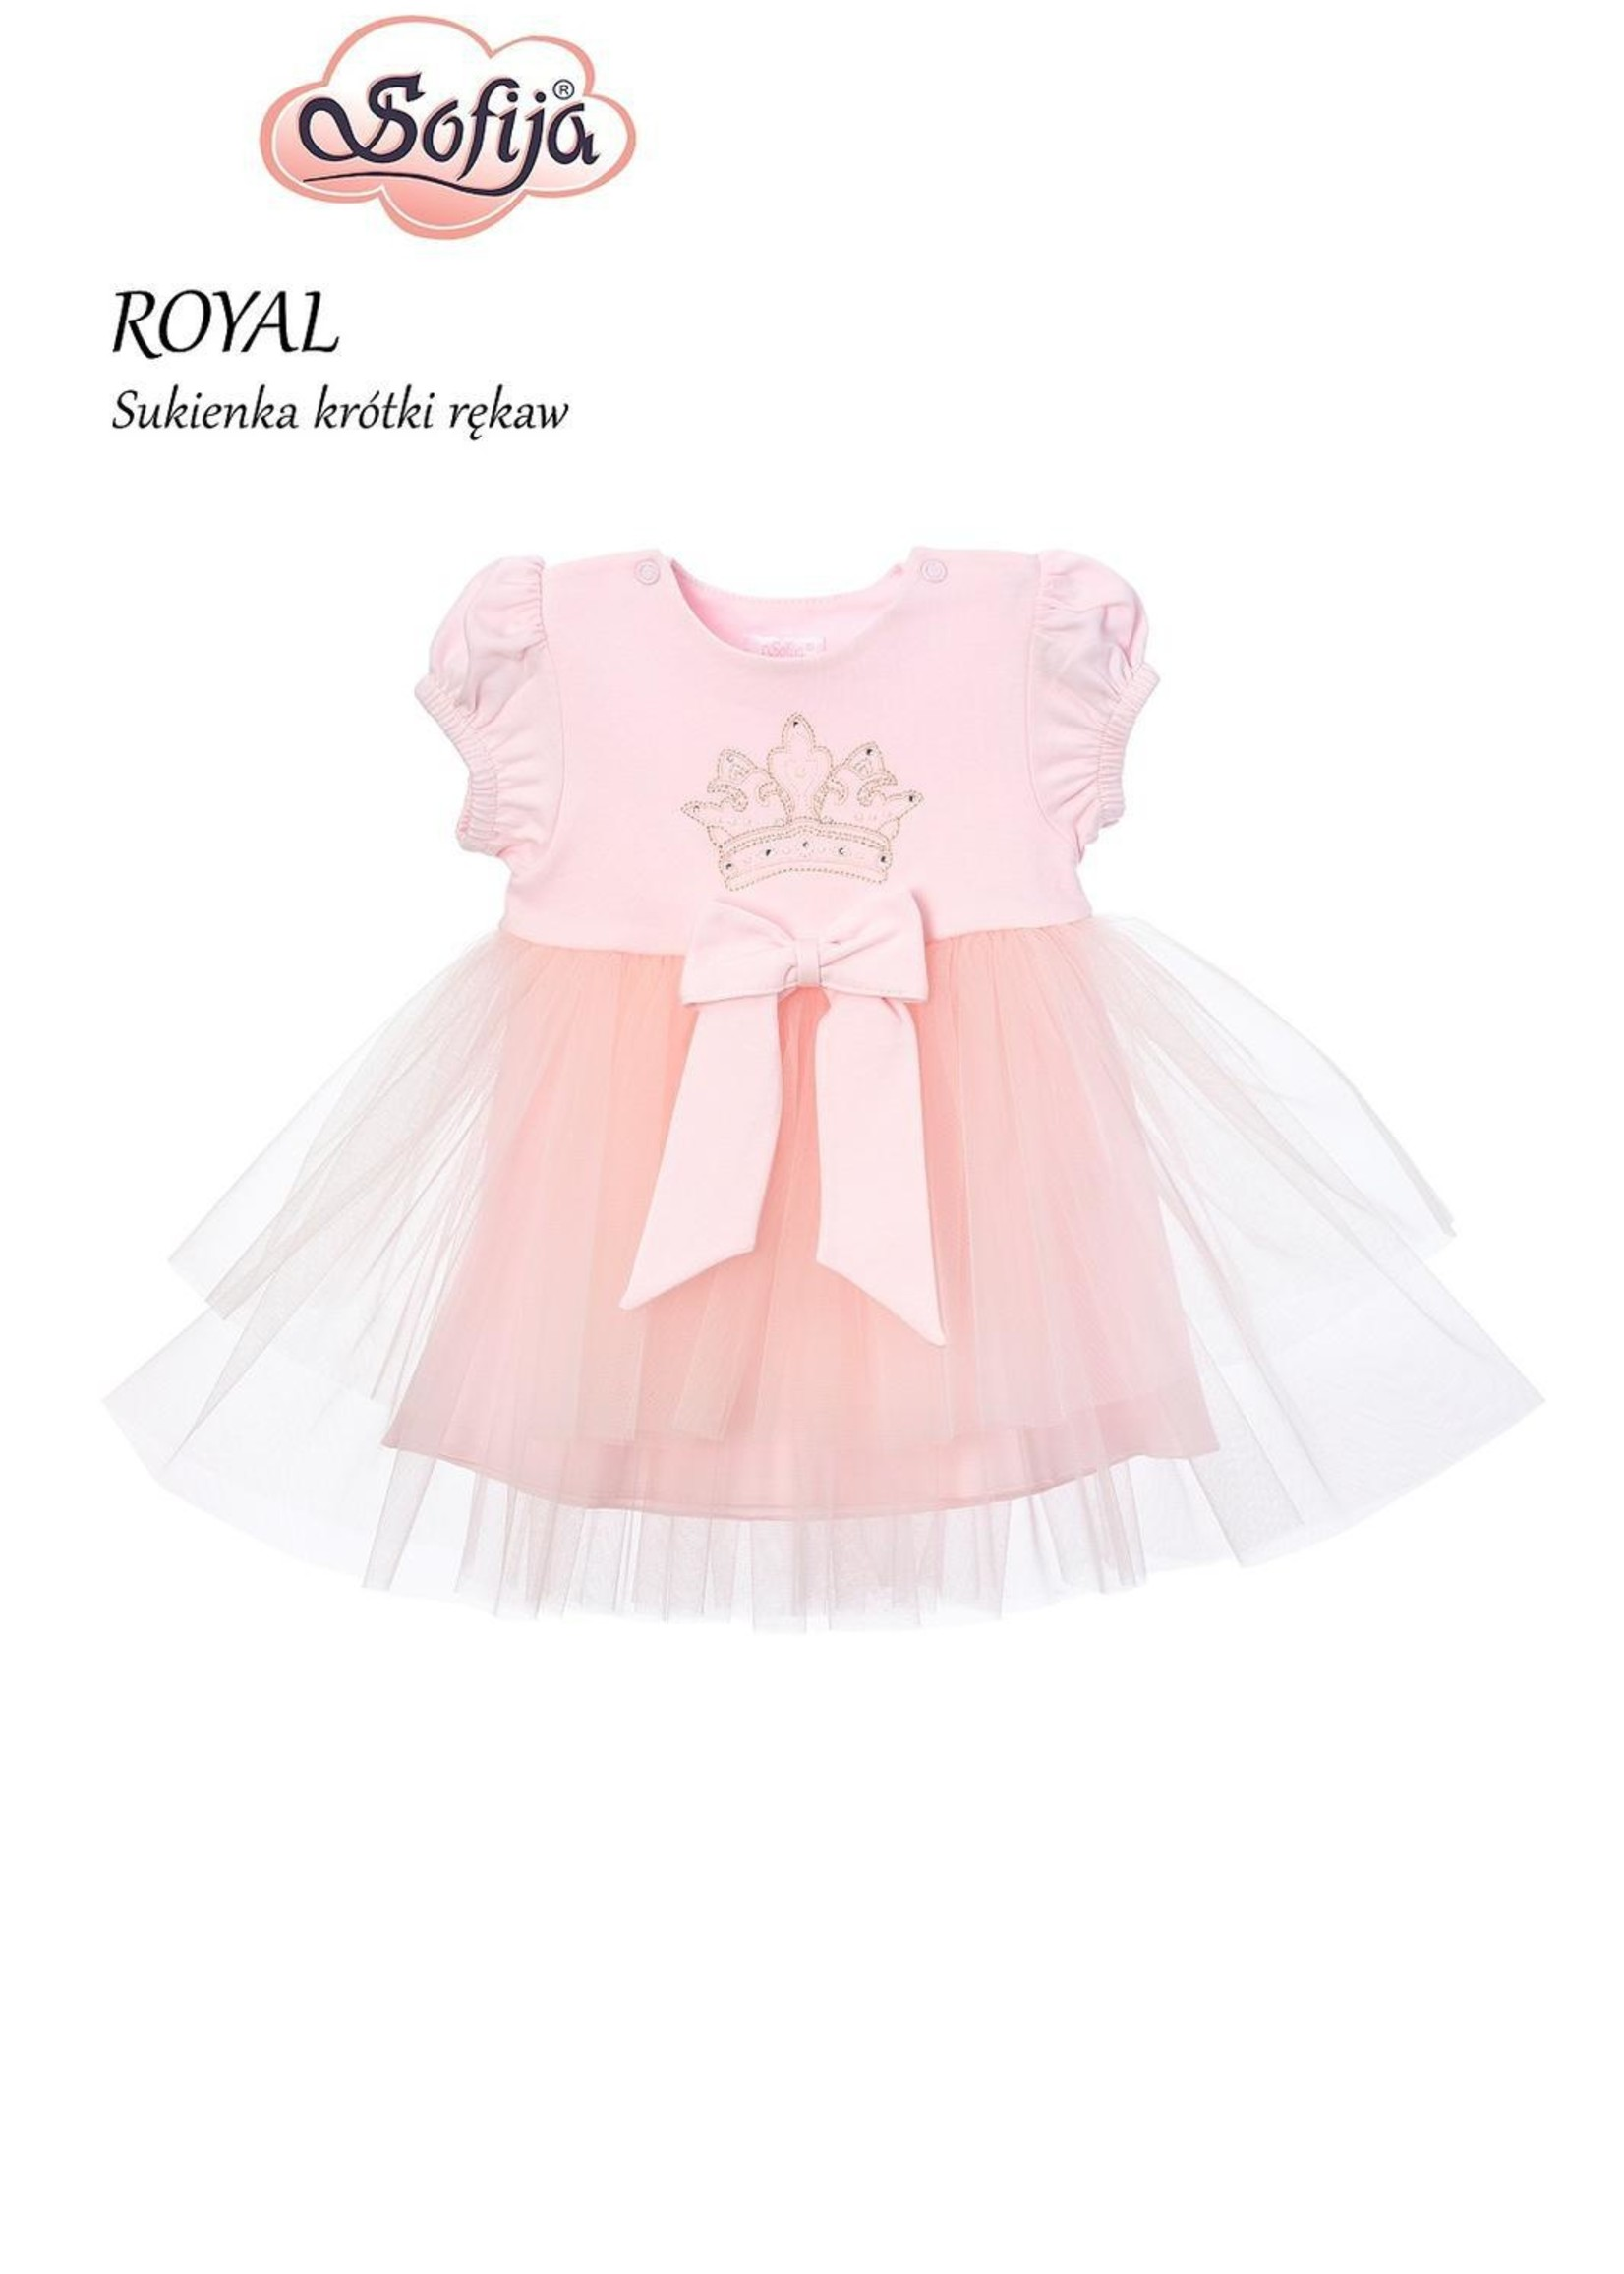 Sofija Sofija crown dress short sleeve pink